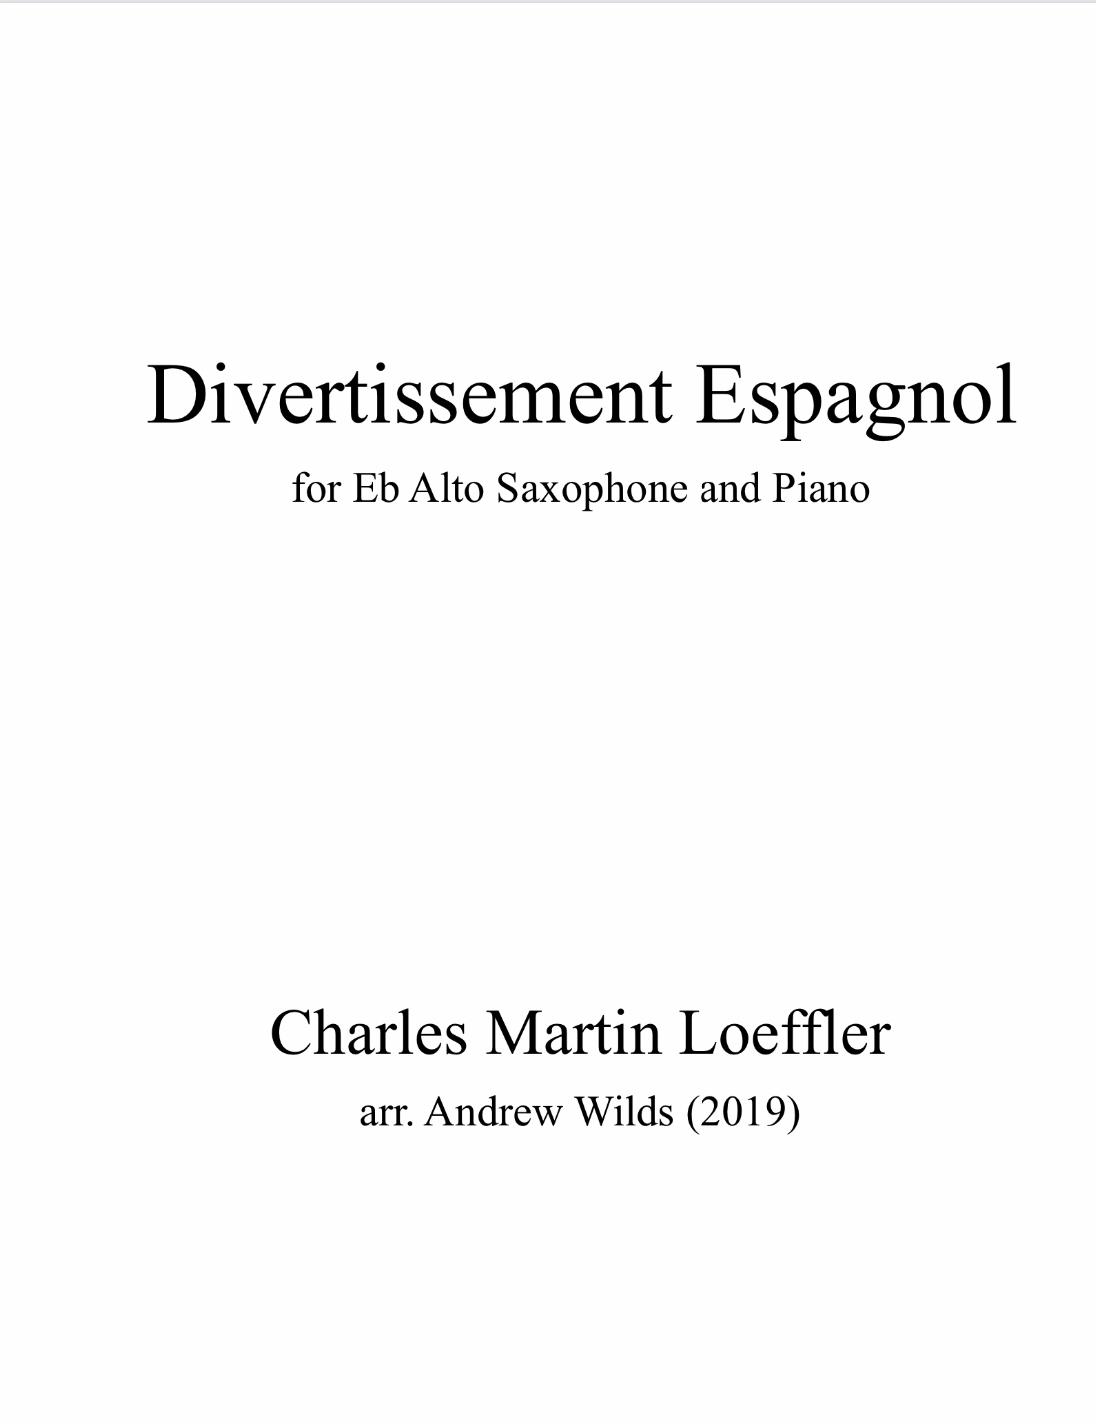 Divertissement Espagnol by arr. Andy Wilds